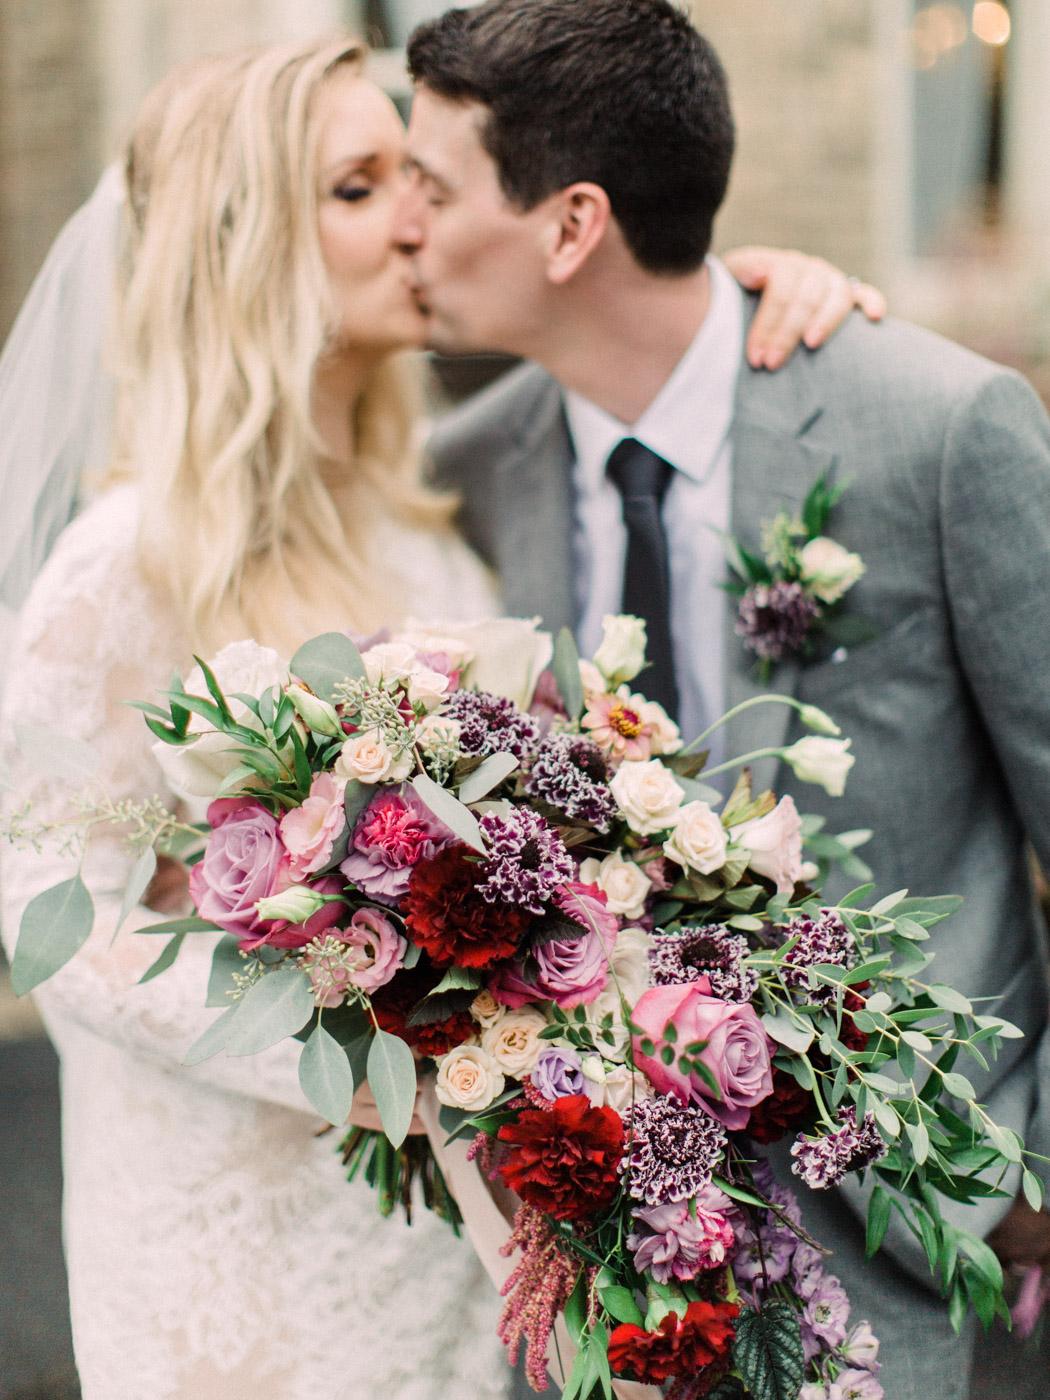 Toronto-wedding-photographer-intimate-classic-fine-art-elopement-ottawa62.jpg